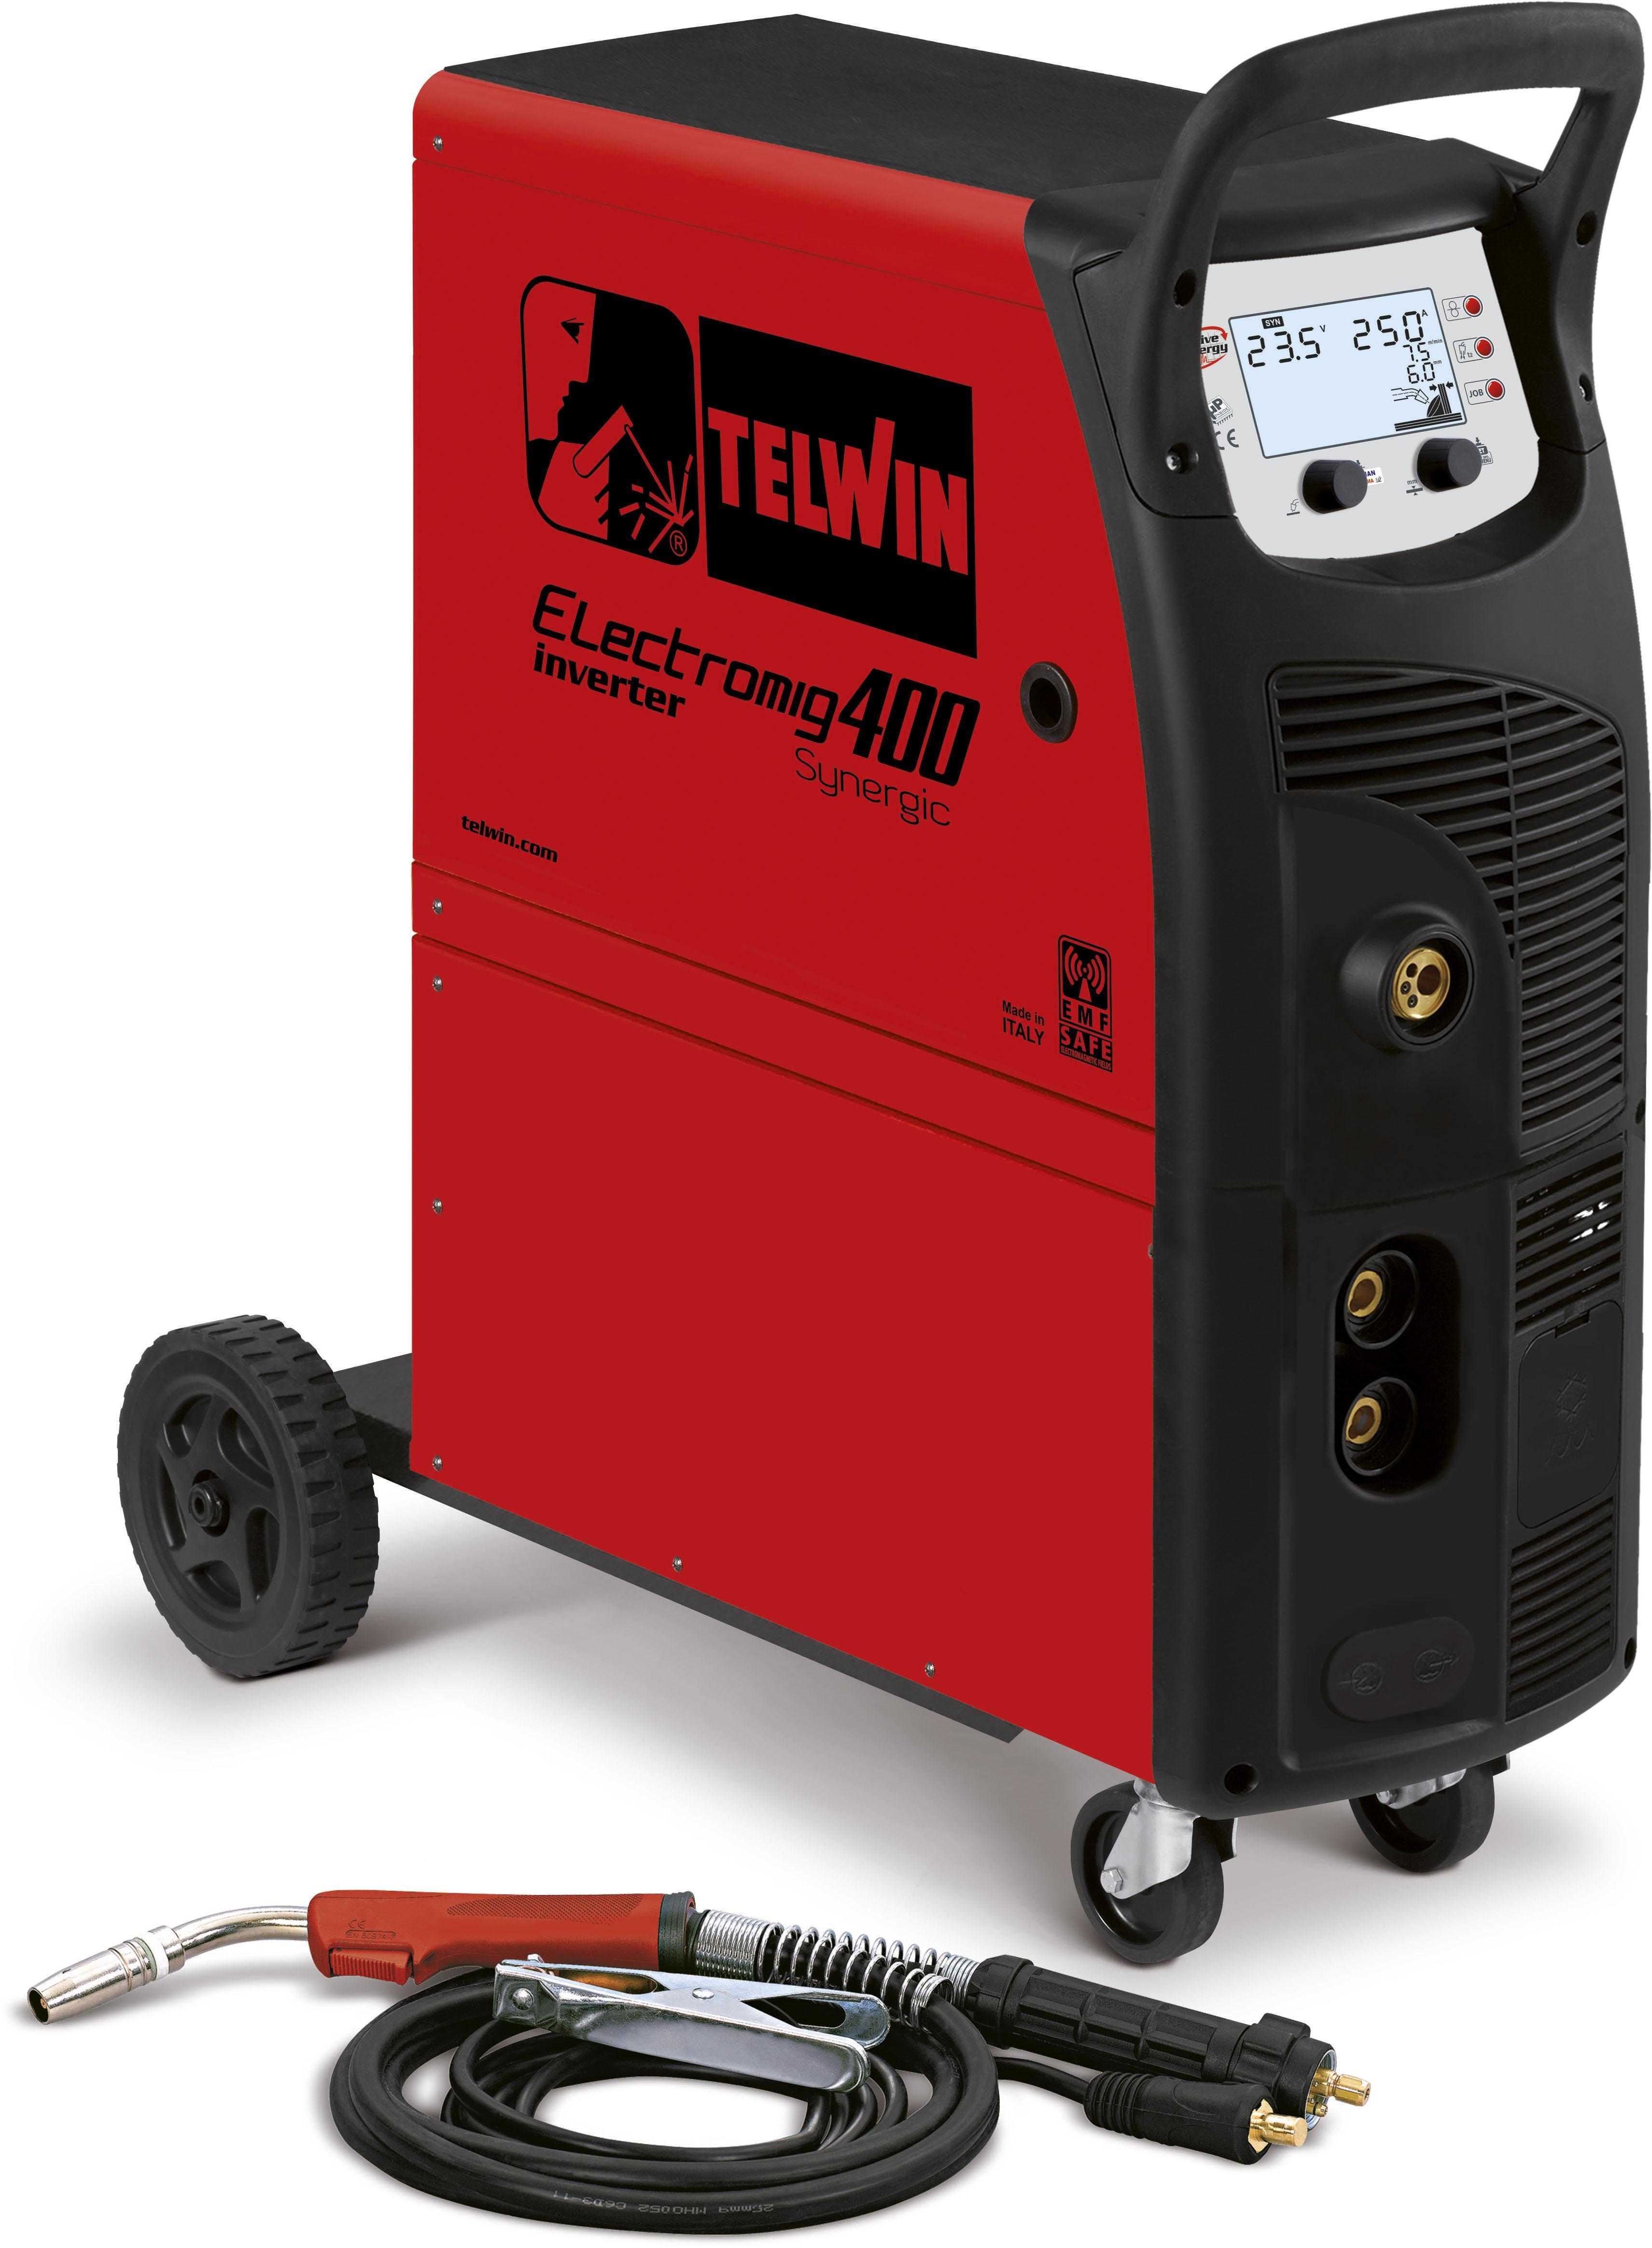 Сварочный полуавтомат Telwin Electromig 400 synergic 230/400v (816090)